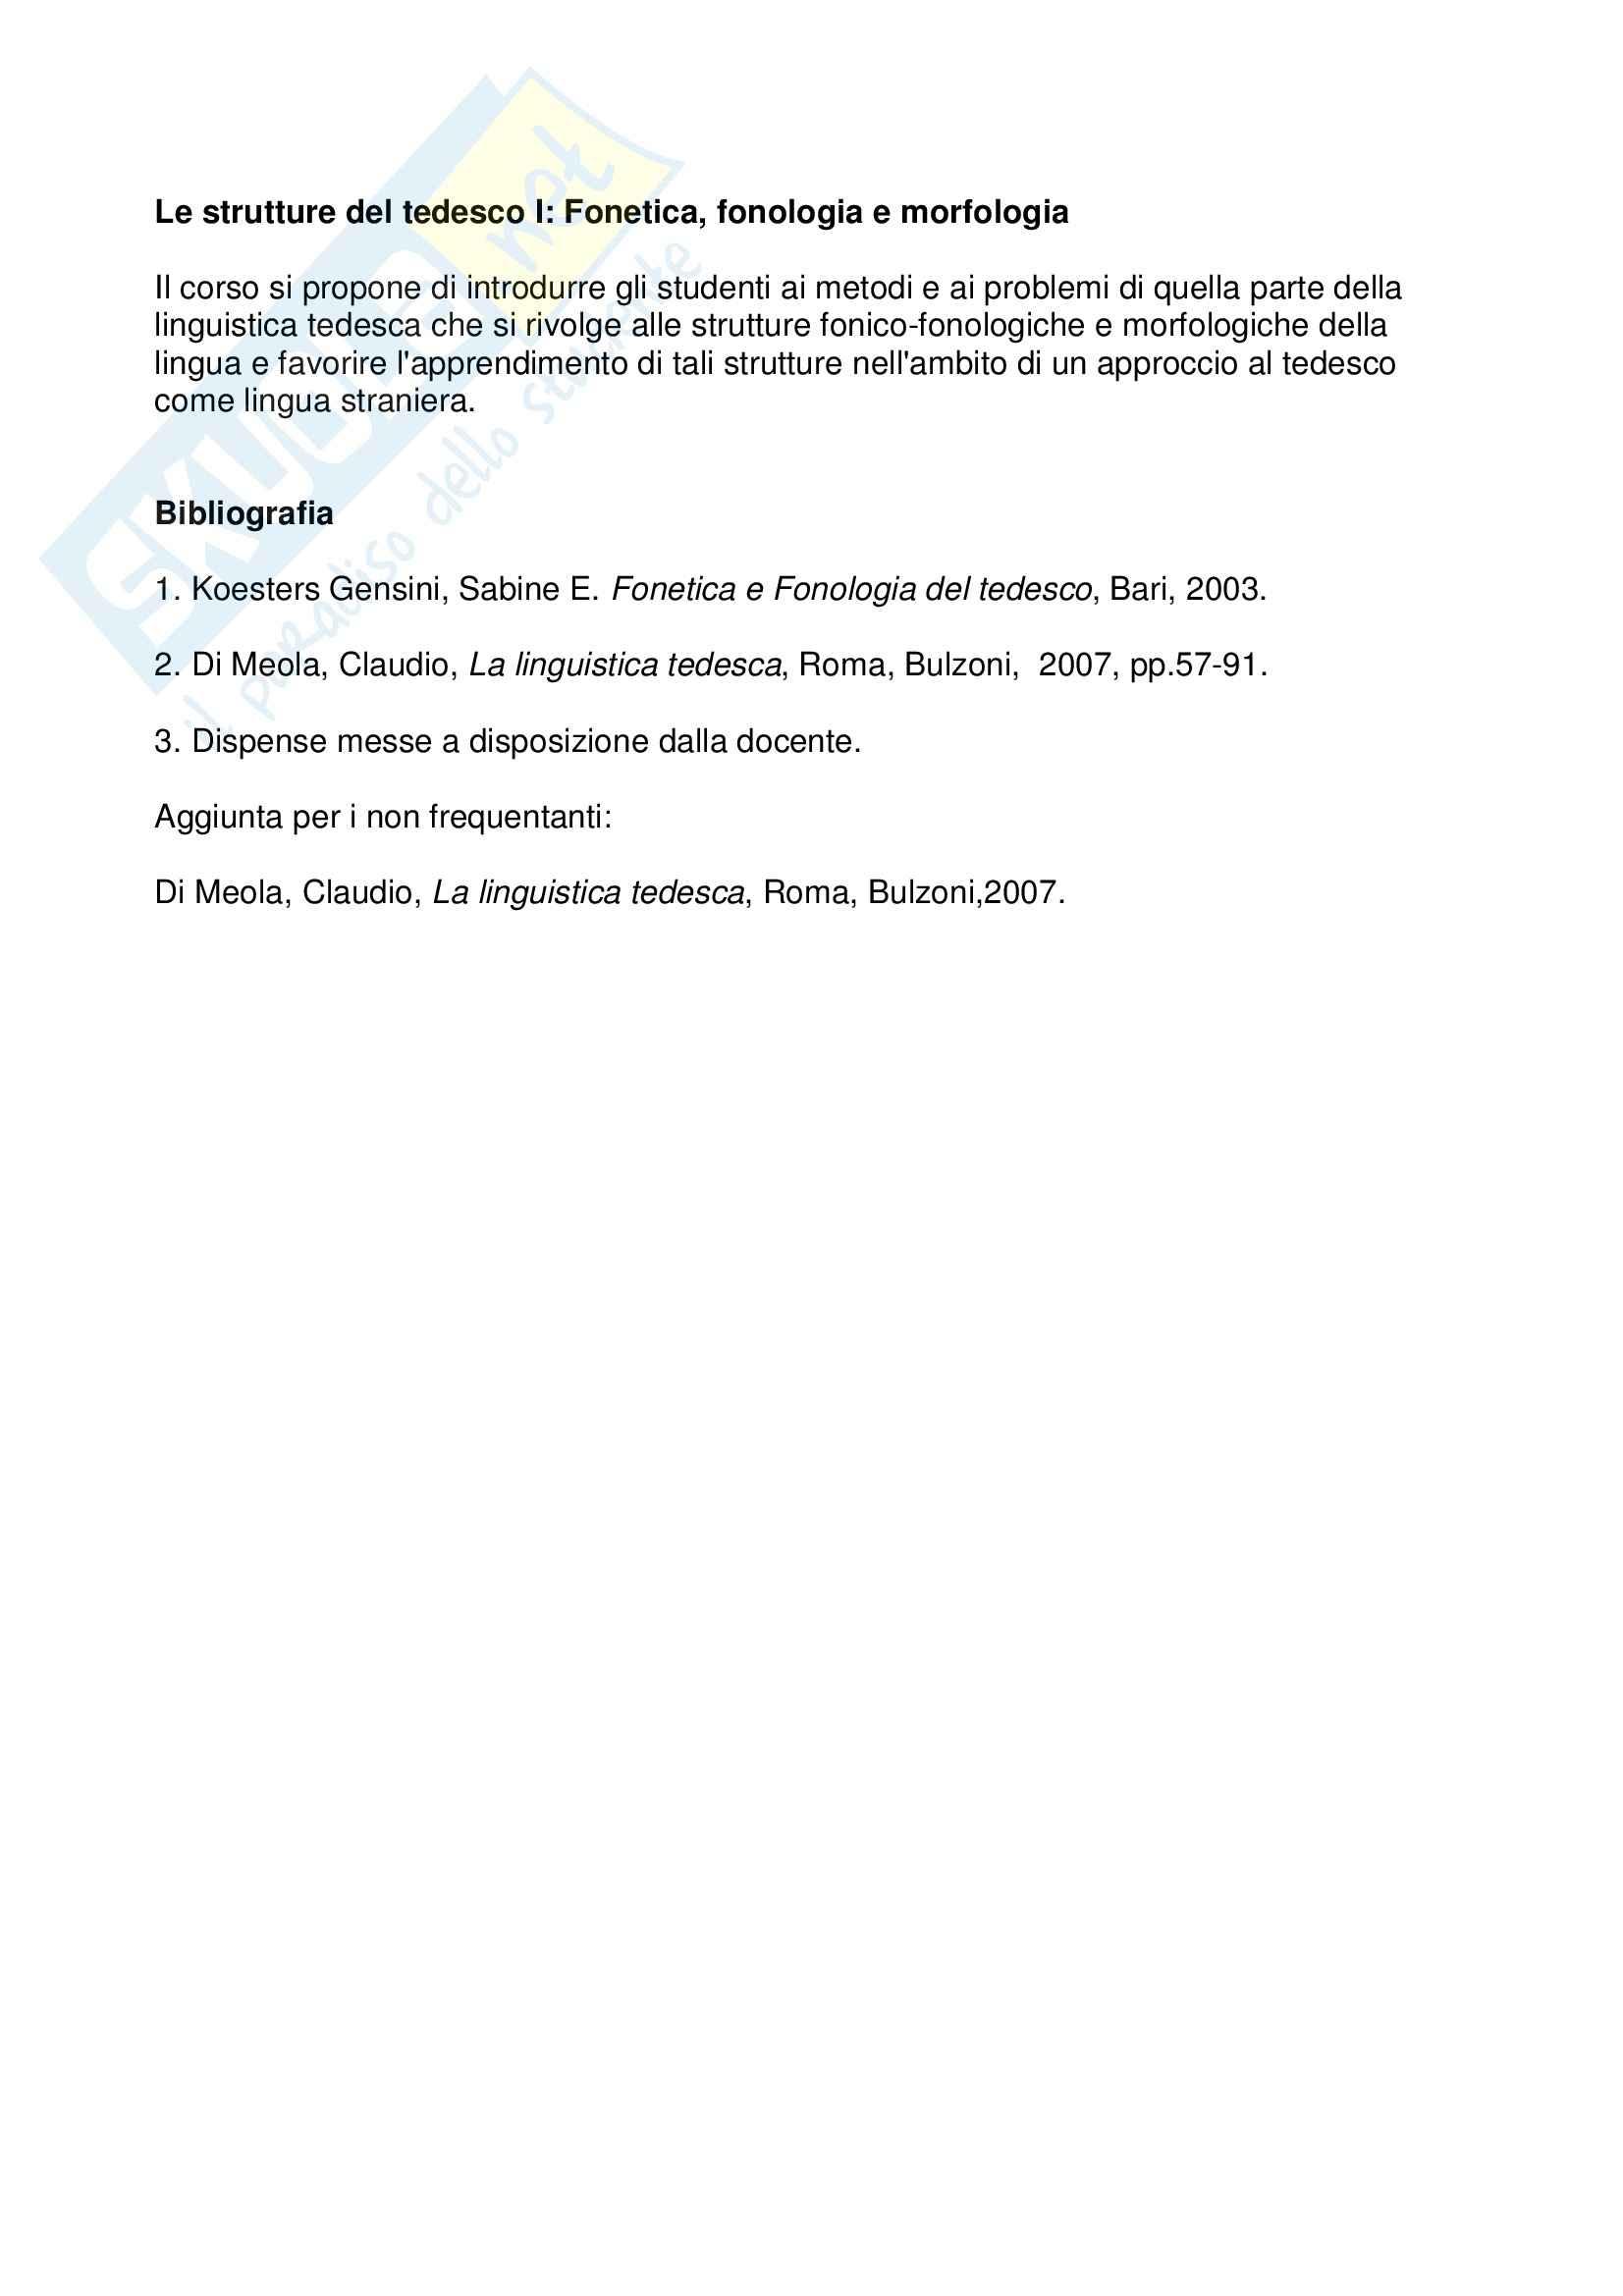 Strutture del tedesco - Fonetica, fonologia e morfologia